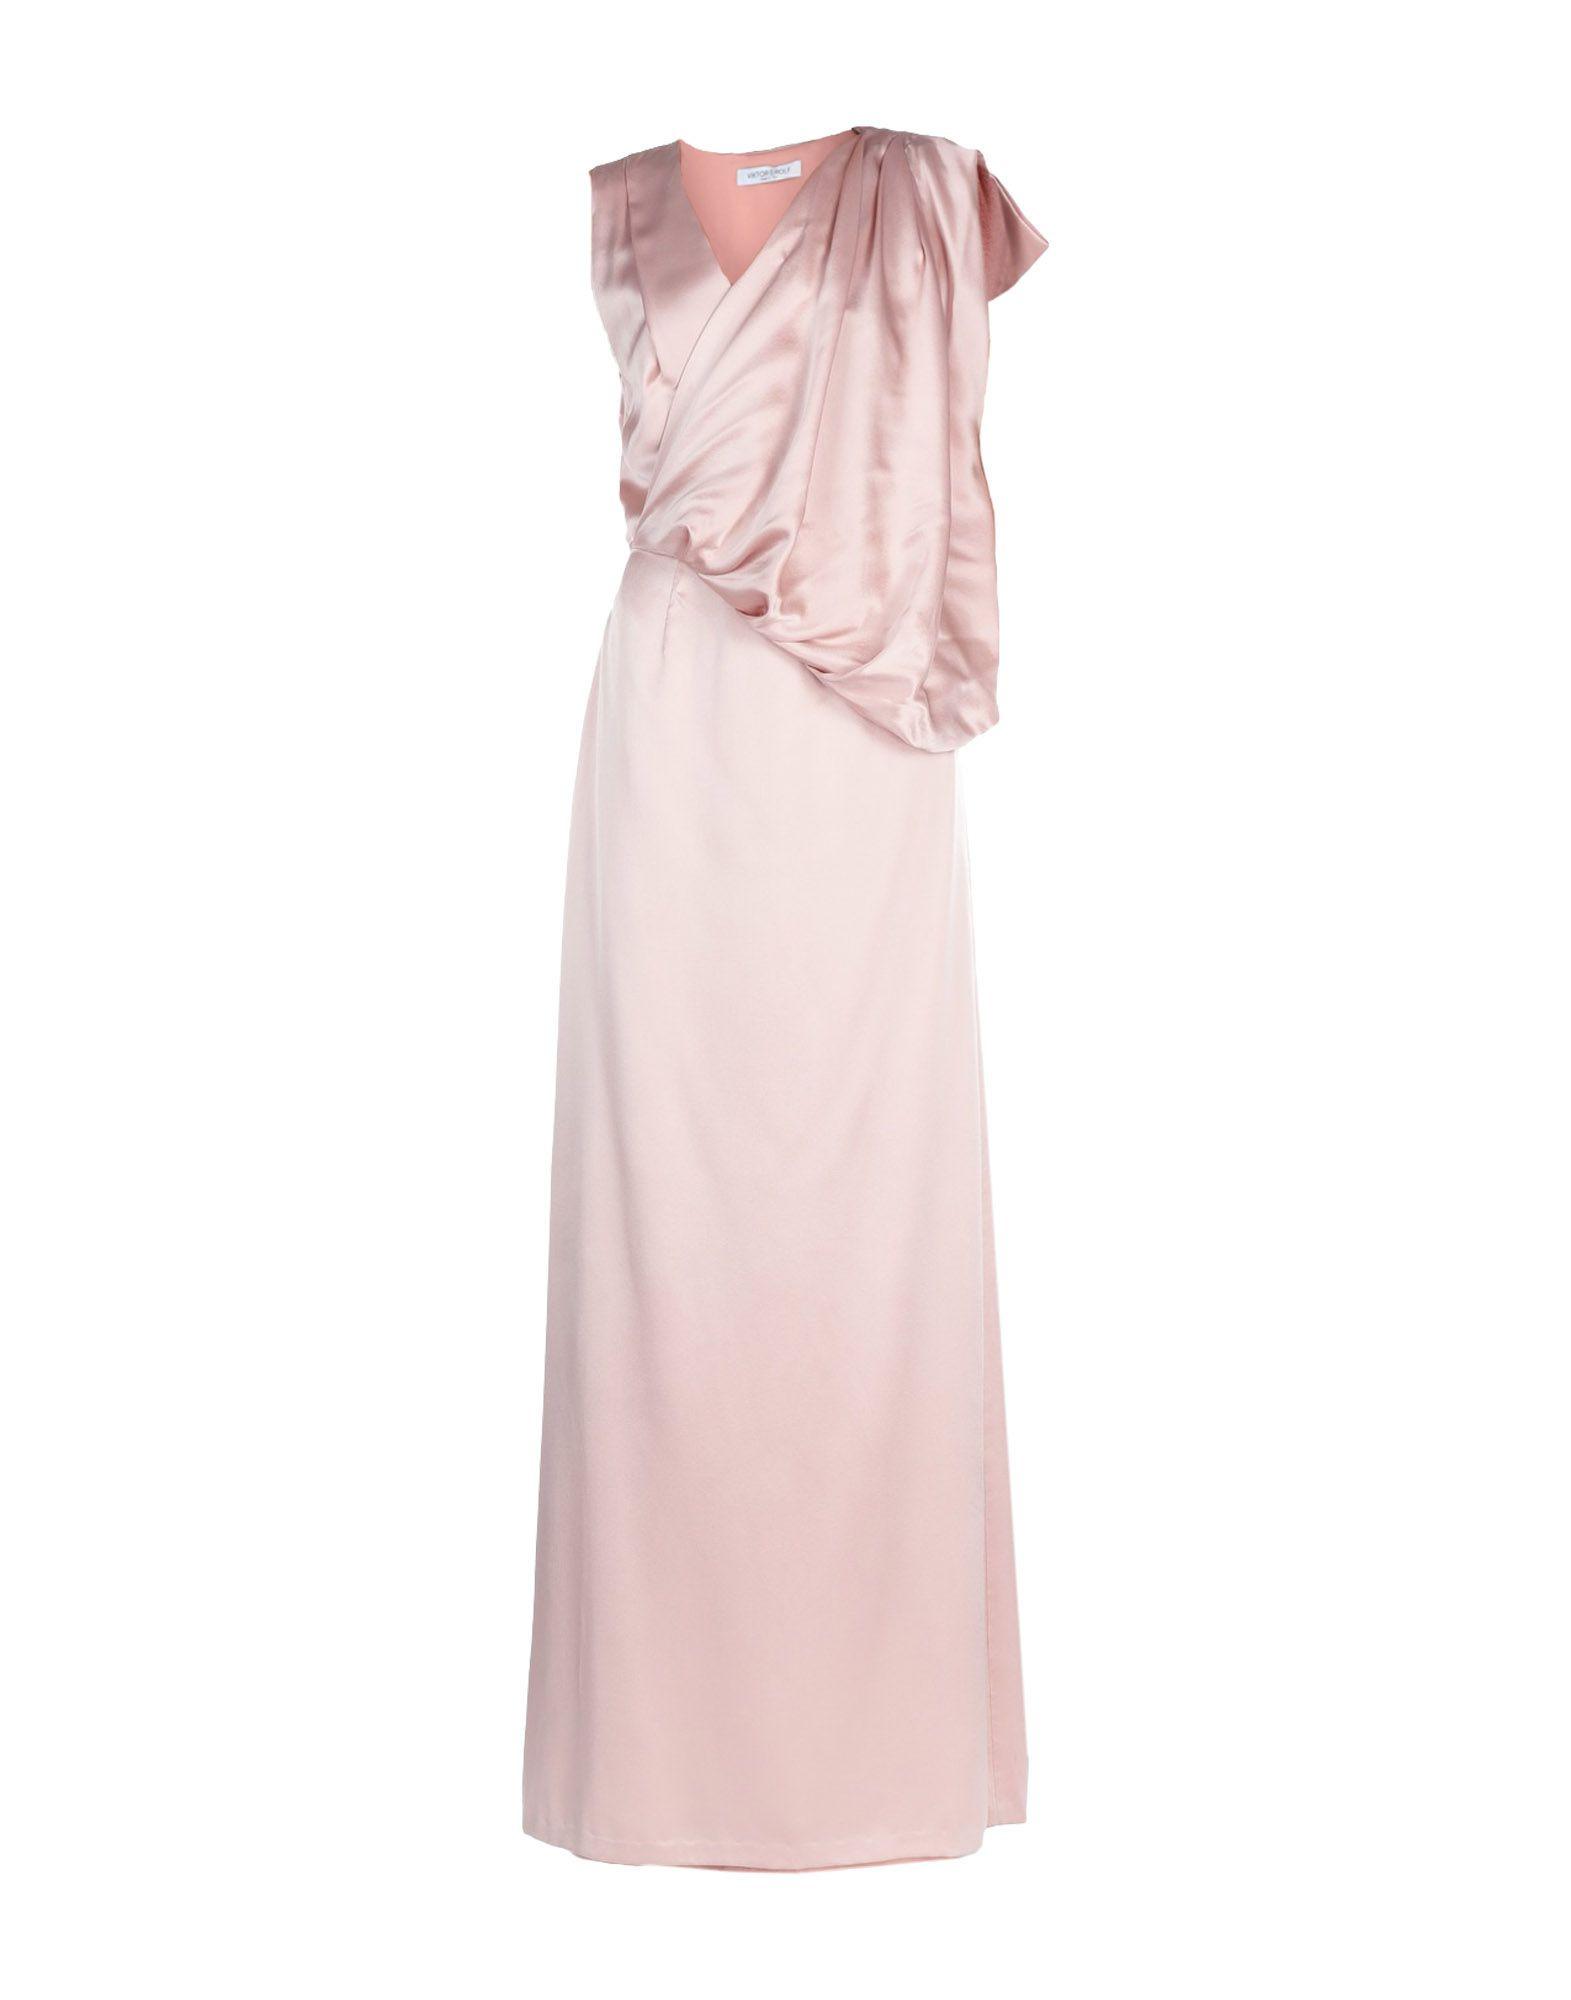 15 Cool Yoox Abendkleid Ärmel17 Leicht Yoox Abendkleid Vertrieb